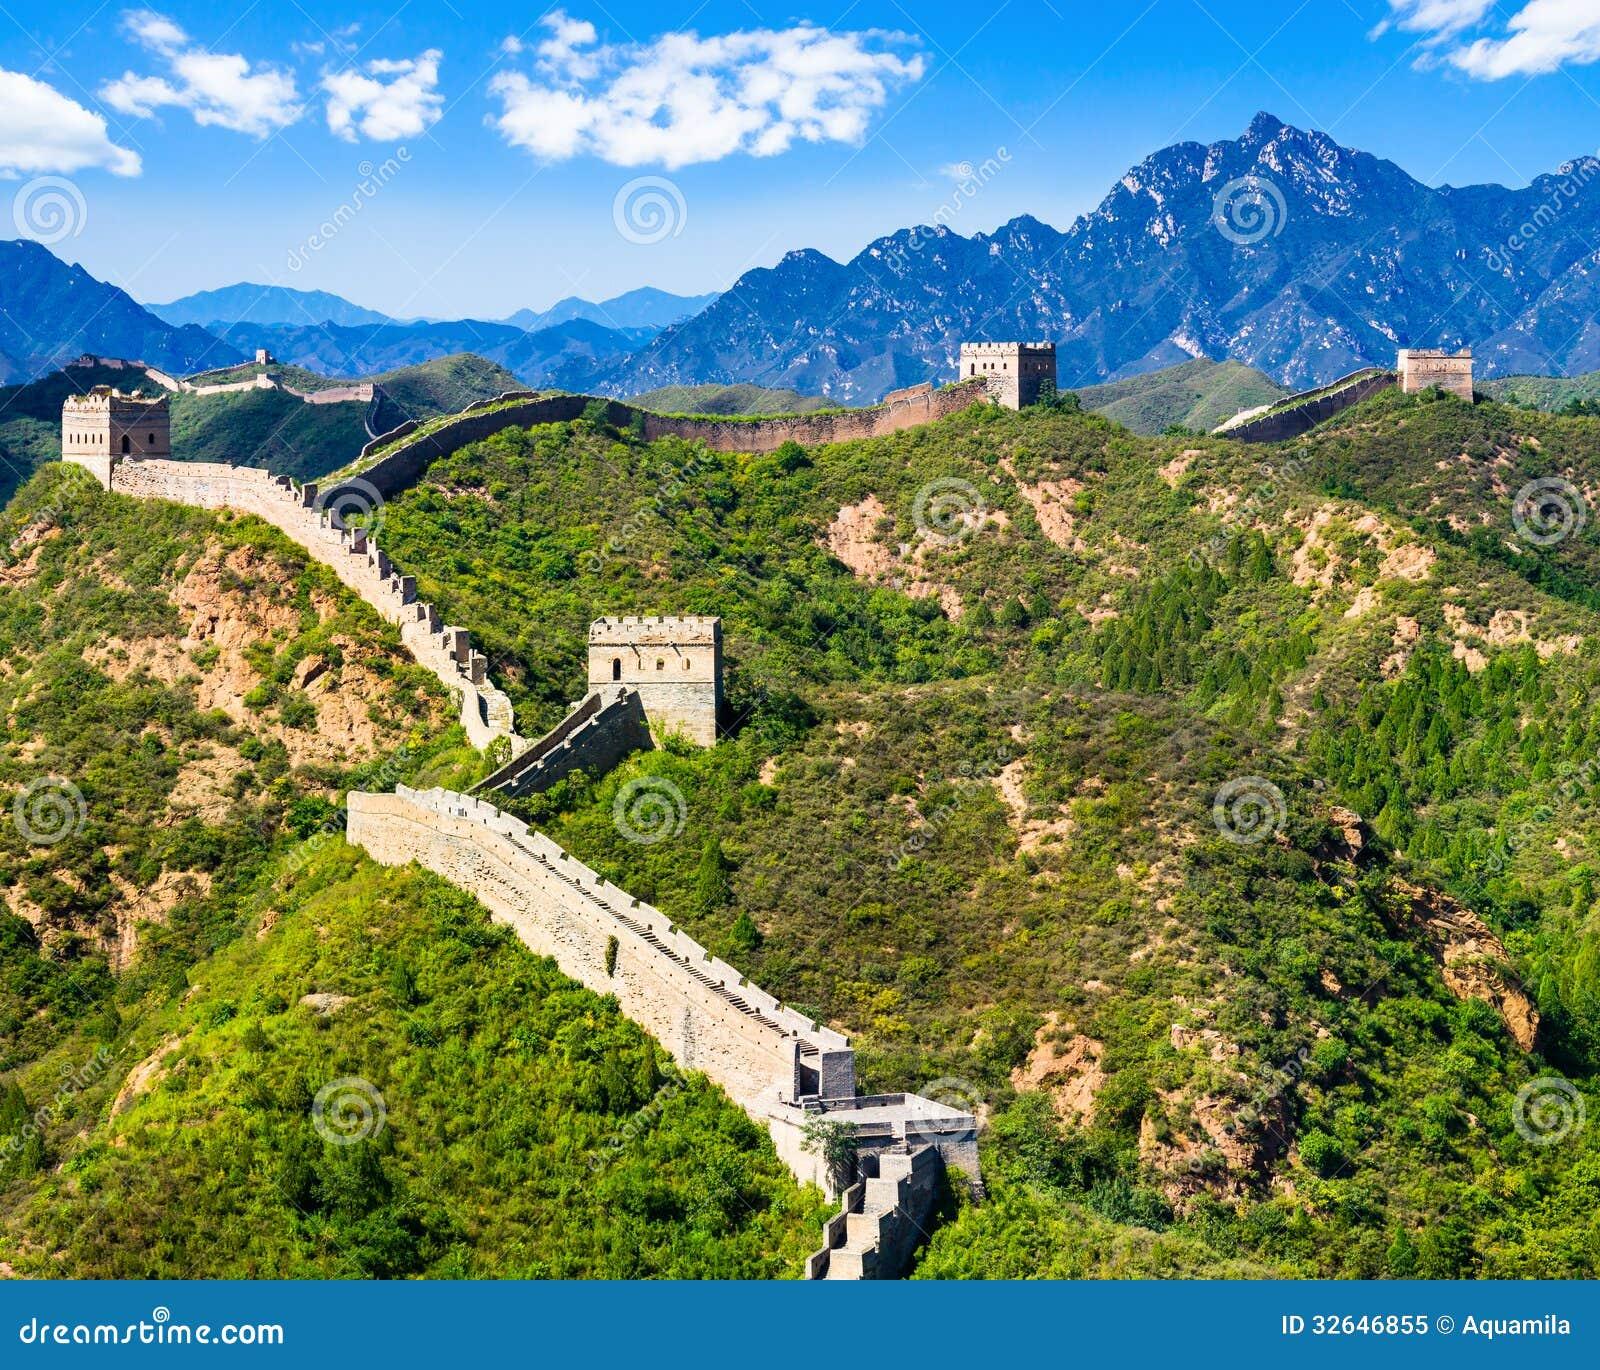 Great Wall of China on summer sunny day, Jinshanling, Beijing